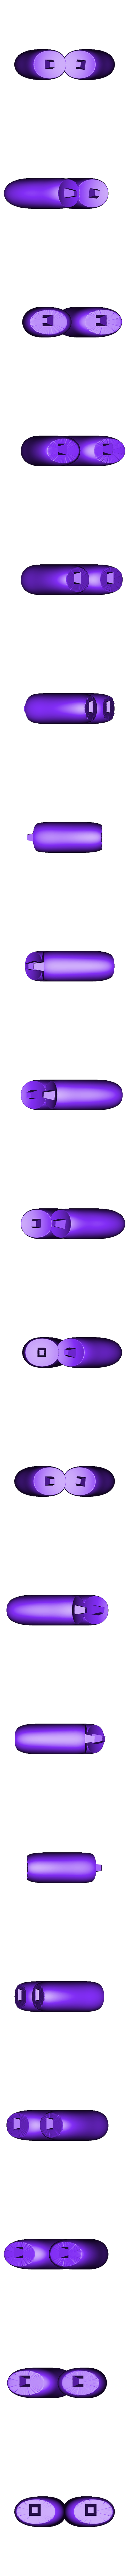 piernas.stl Download free STL file PIGLET - winnie pooh, tender, gentle • 3D print object, RMMAKER